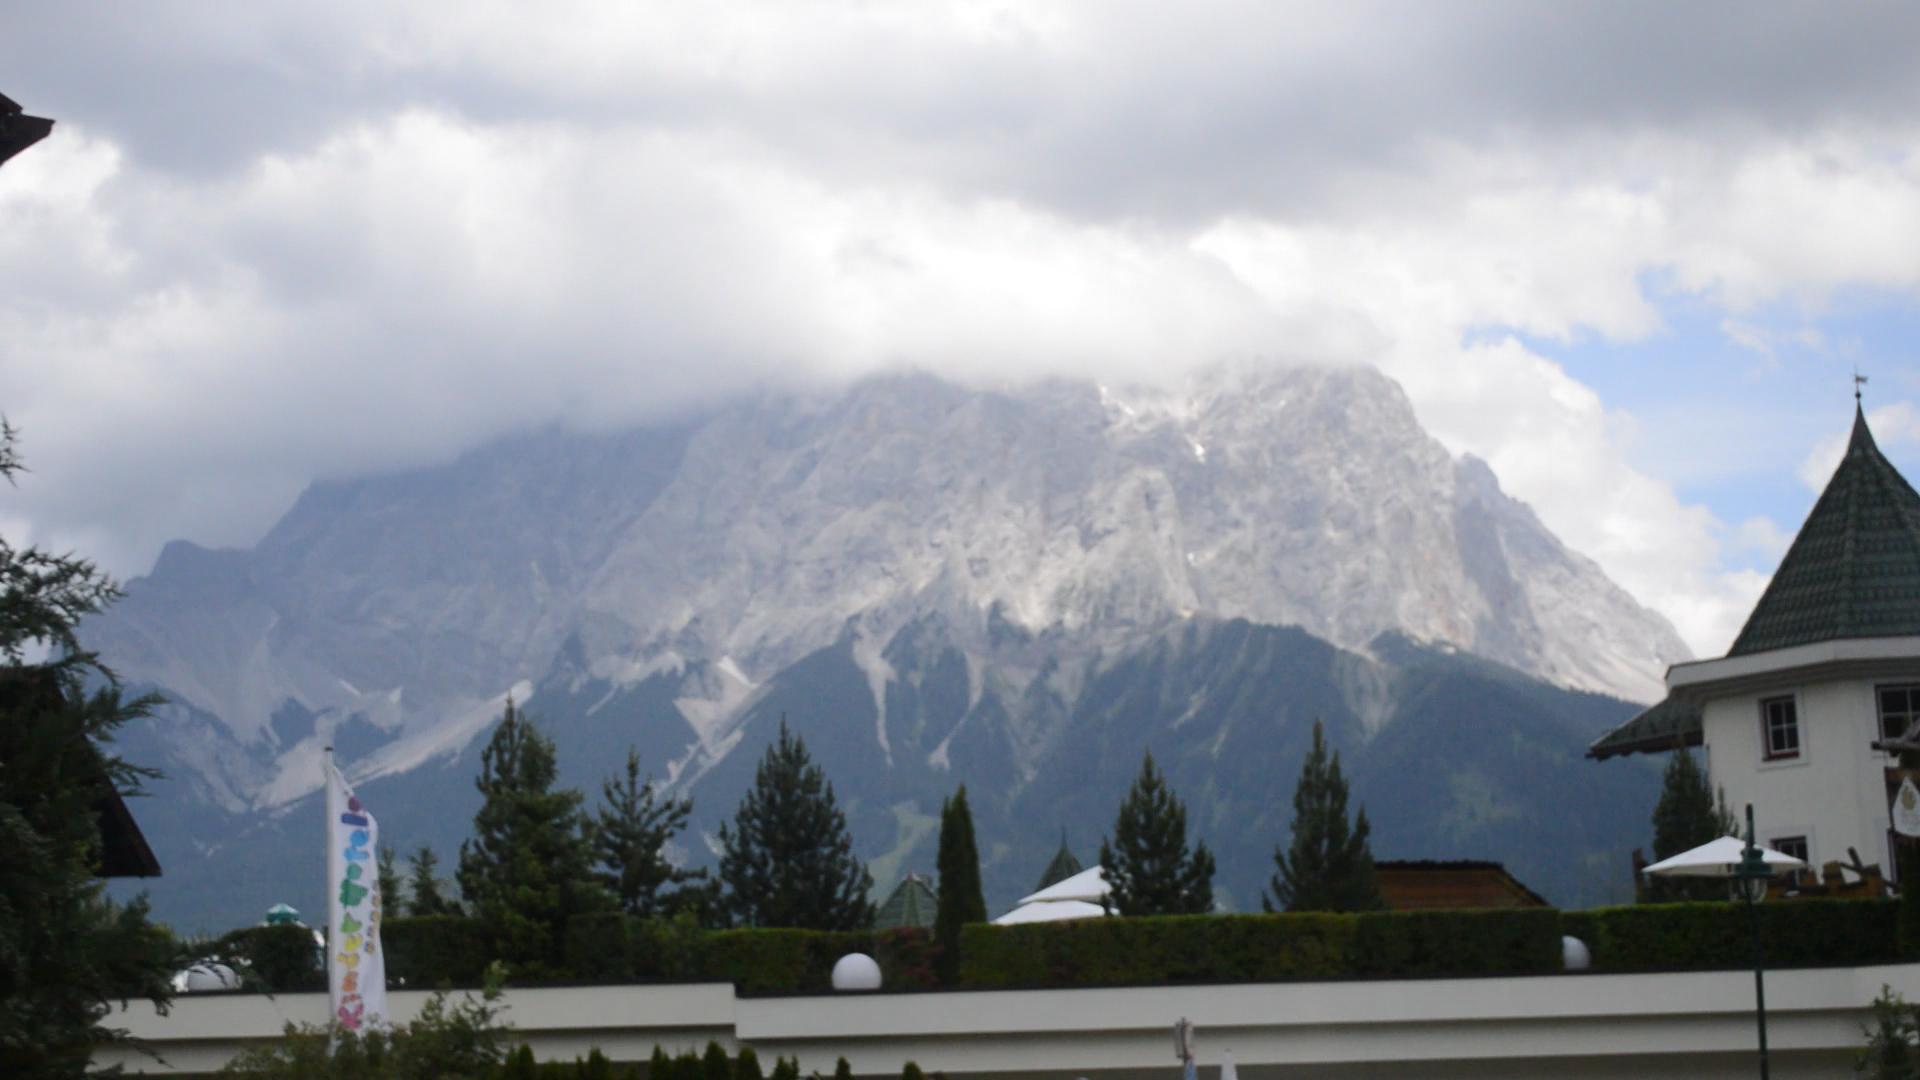 Bavaria region, Germany